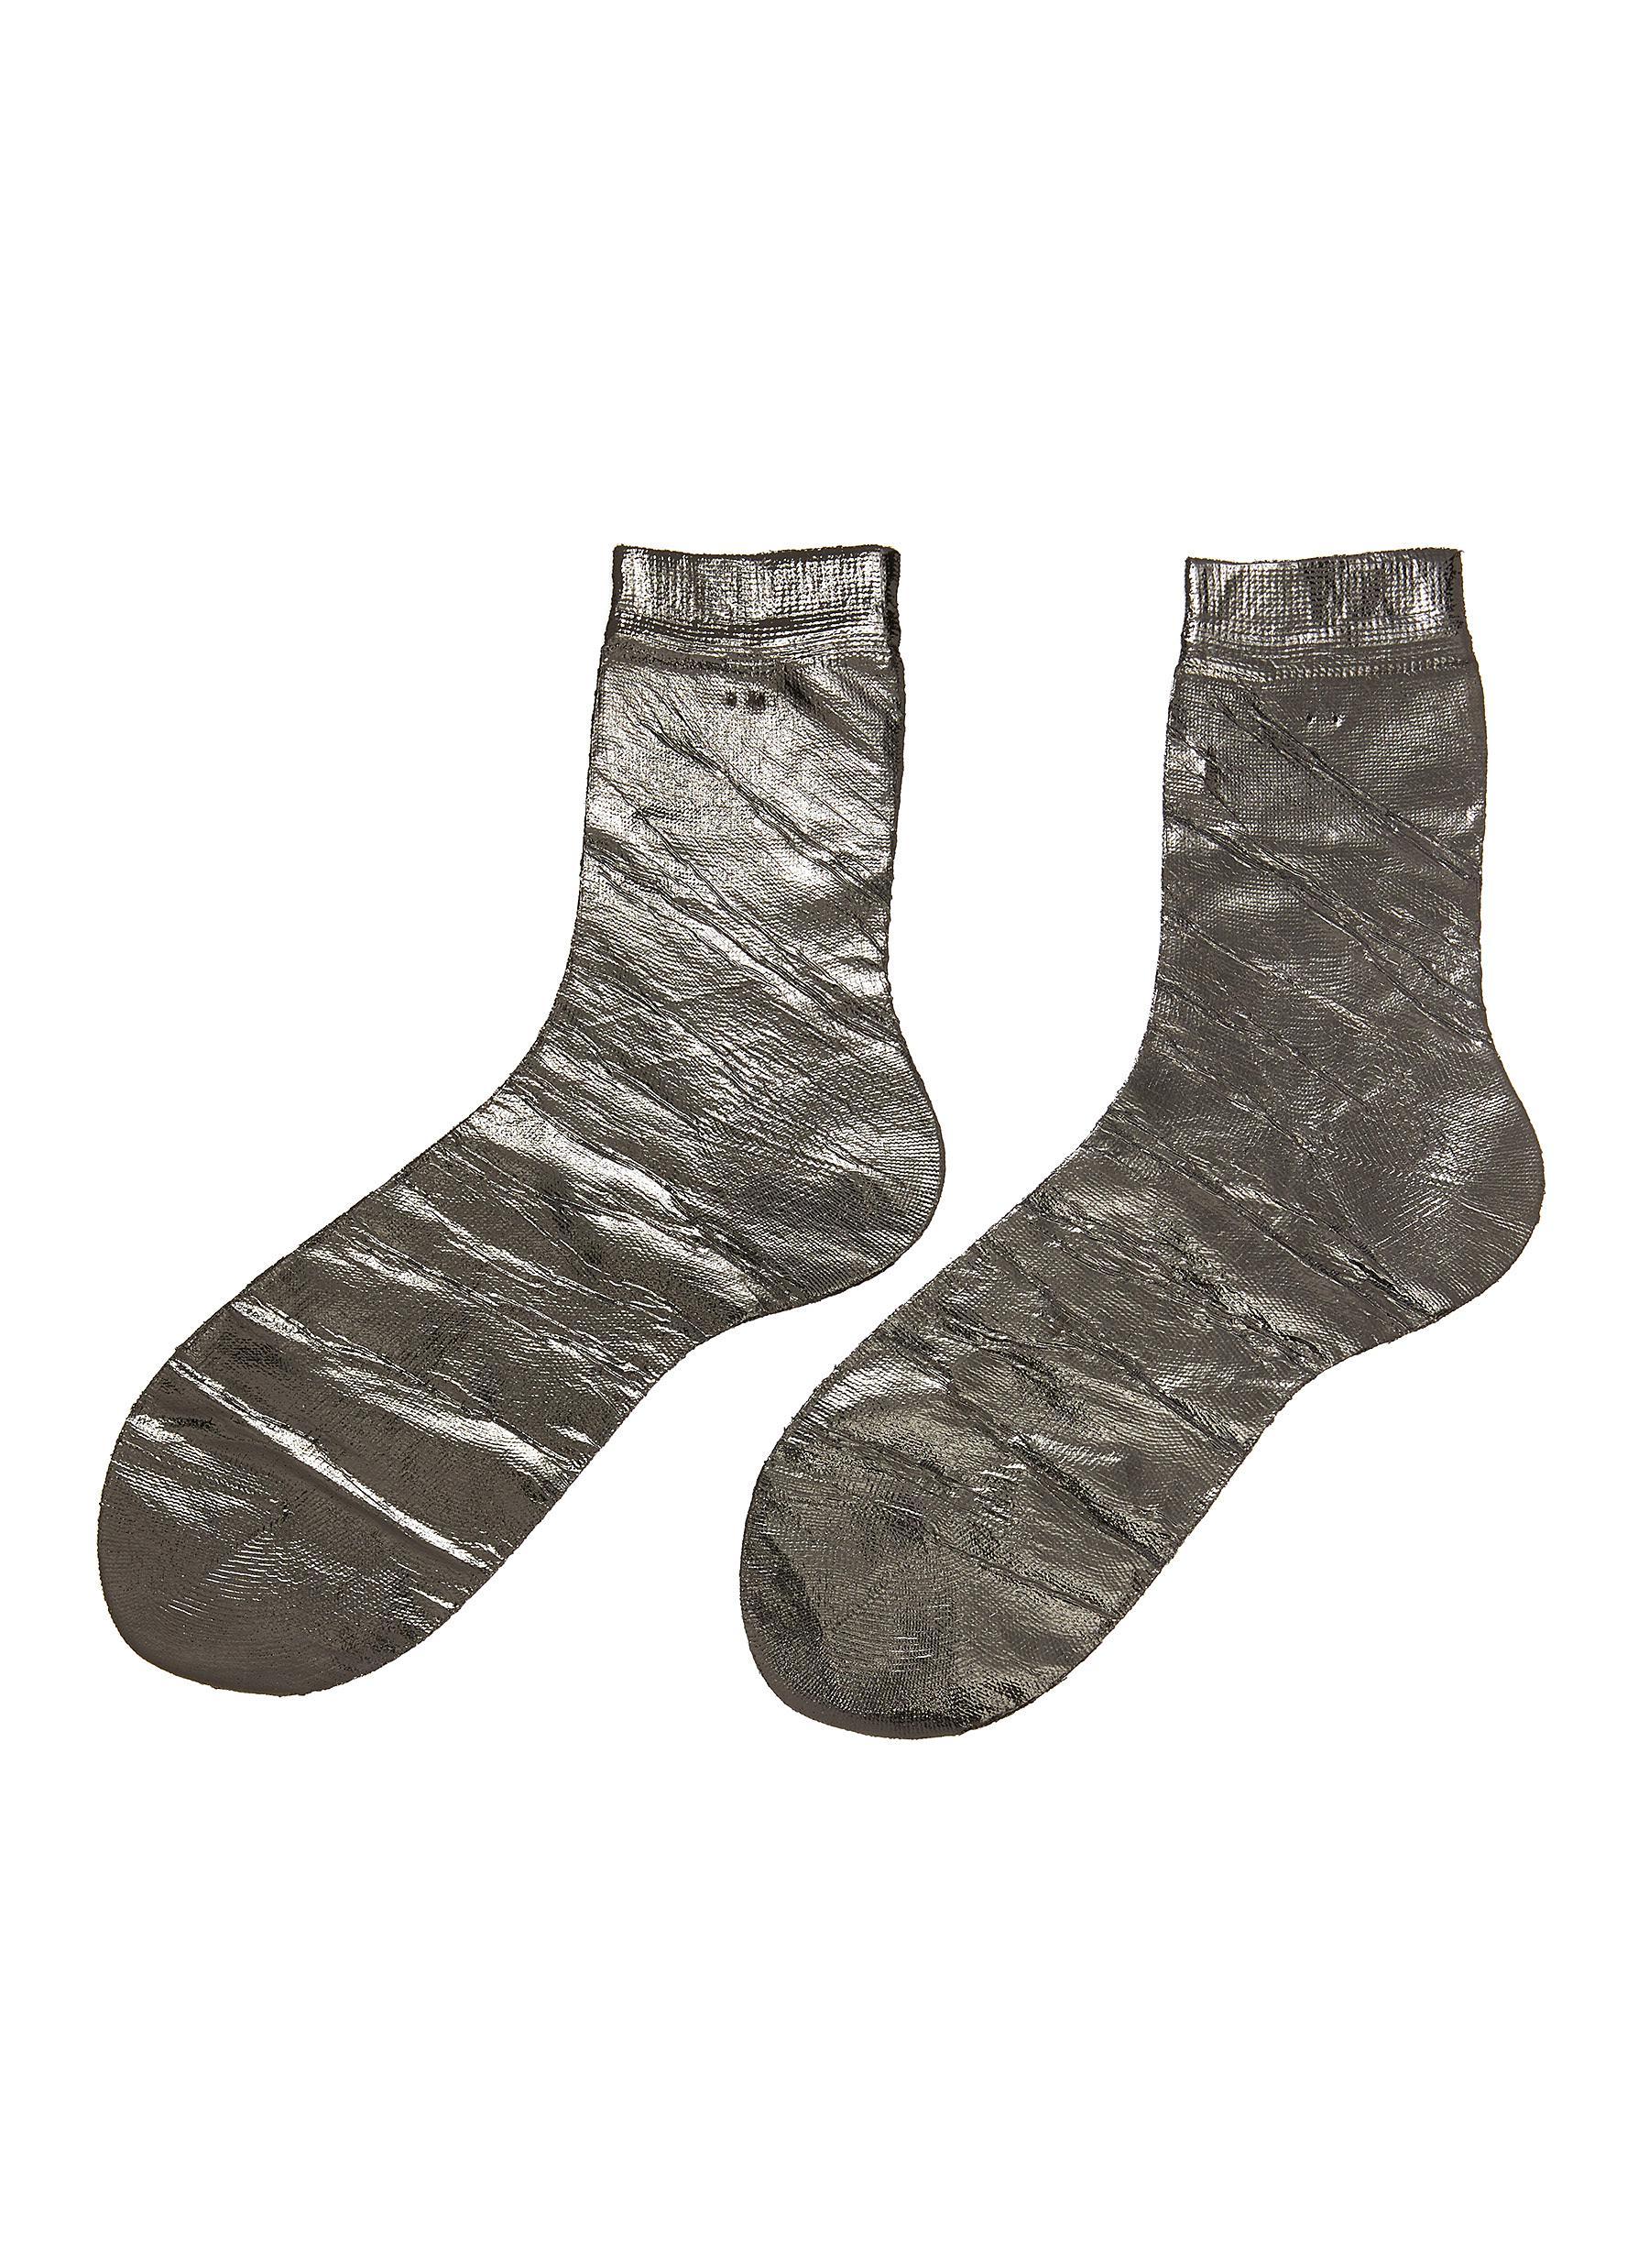 Laminated One' Foil Effect Silk Blend Crew Socks